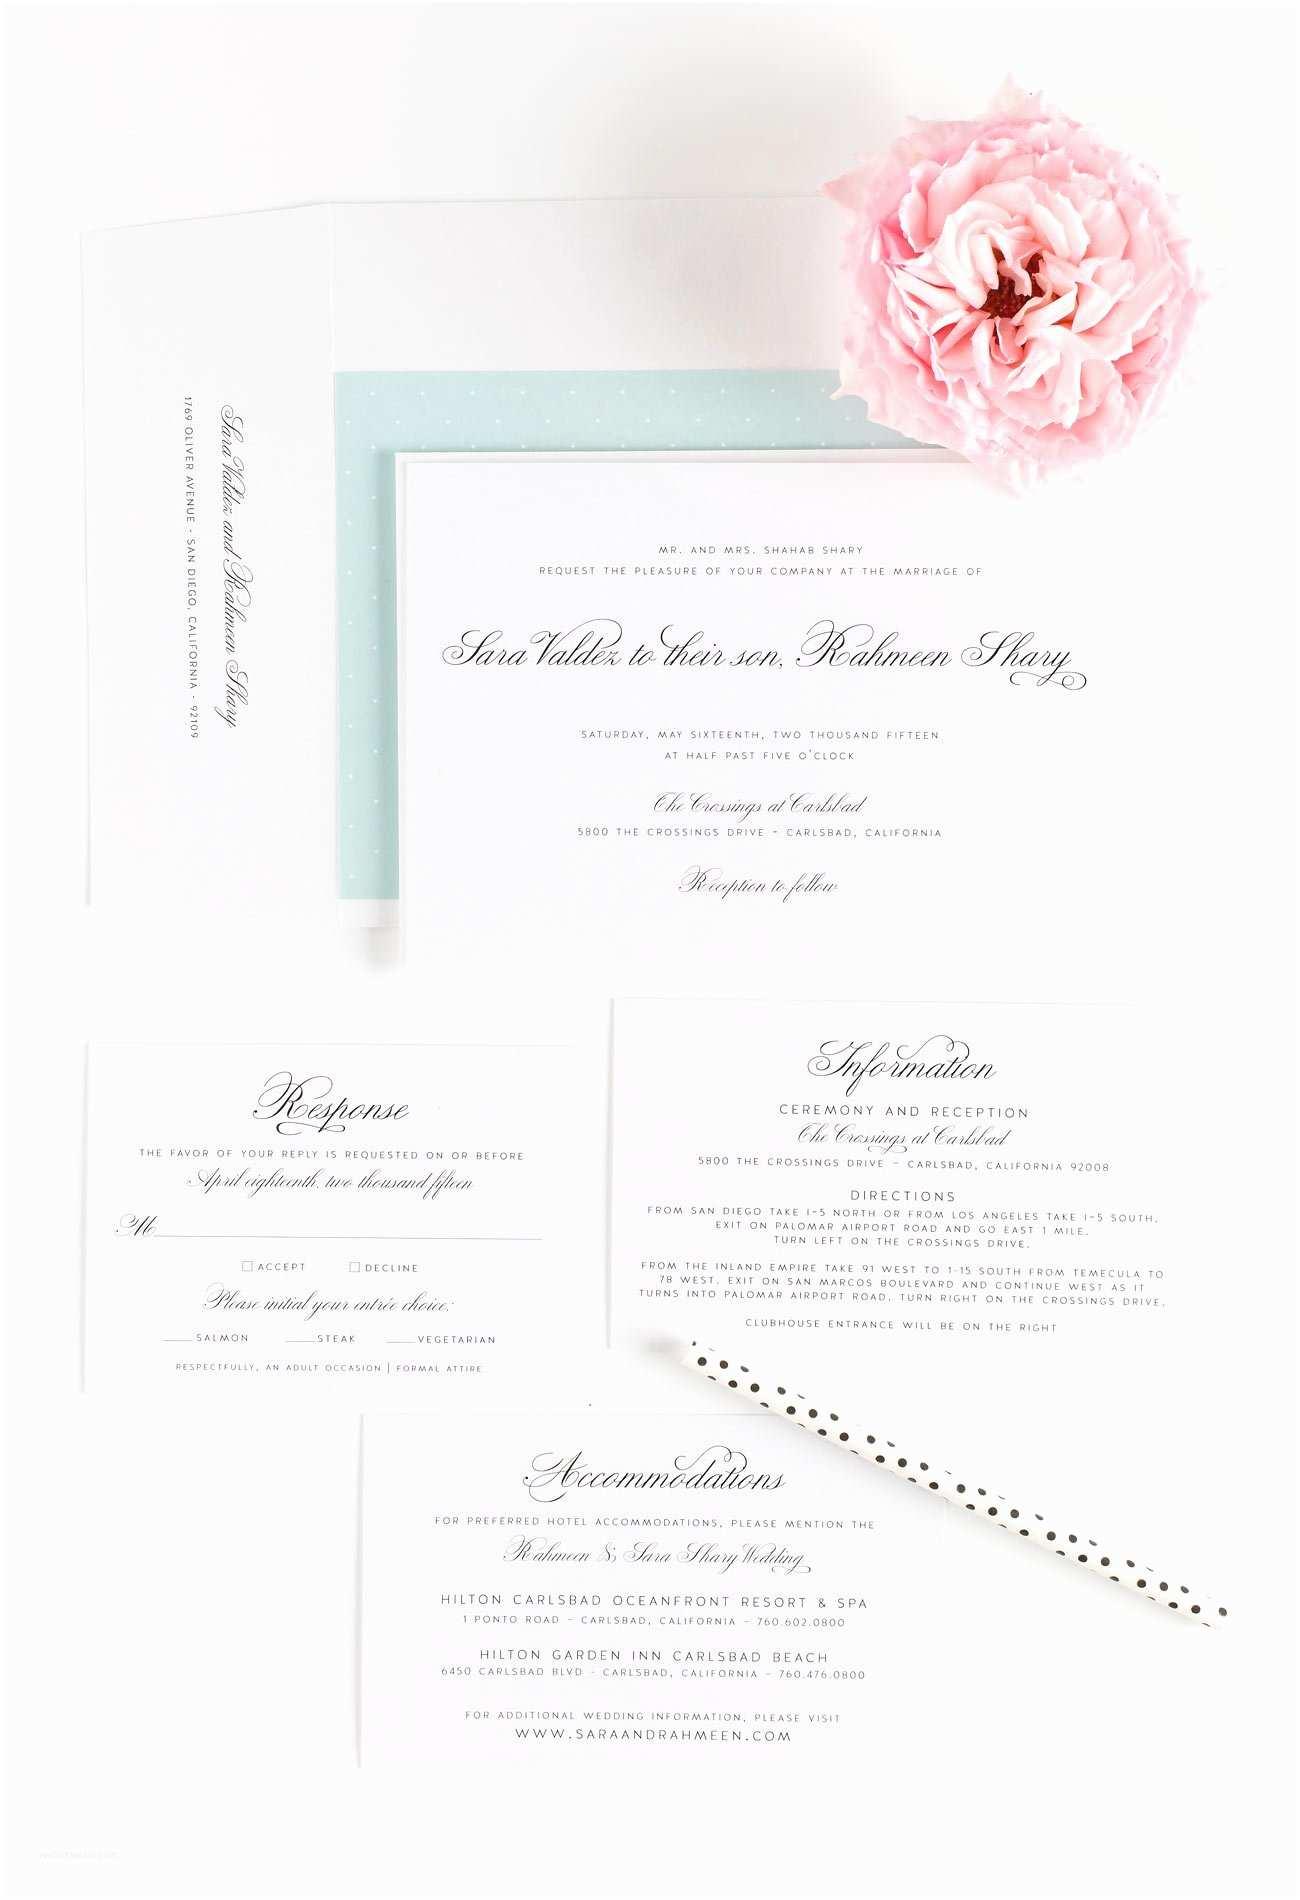 Minted Wedding Invitations Mint Green Wedding Invitation Templates Free Yaseen for